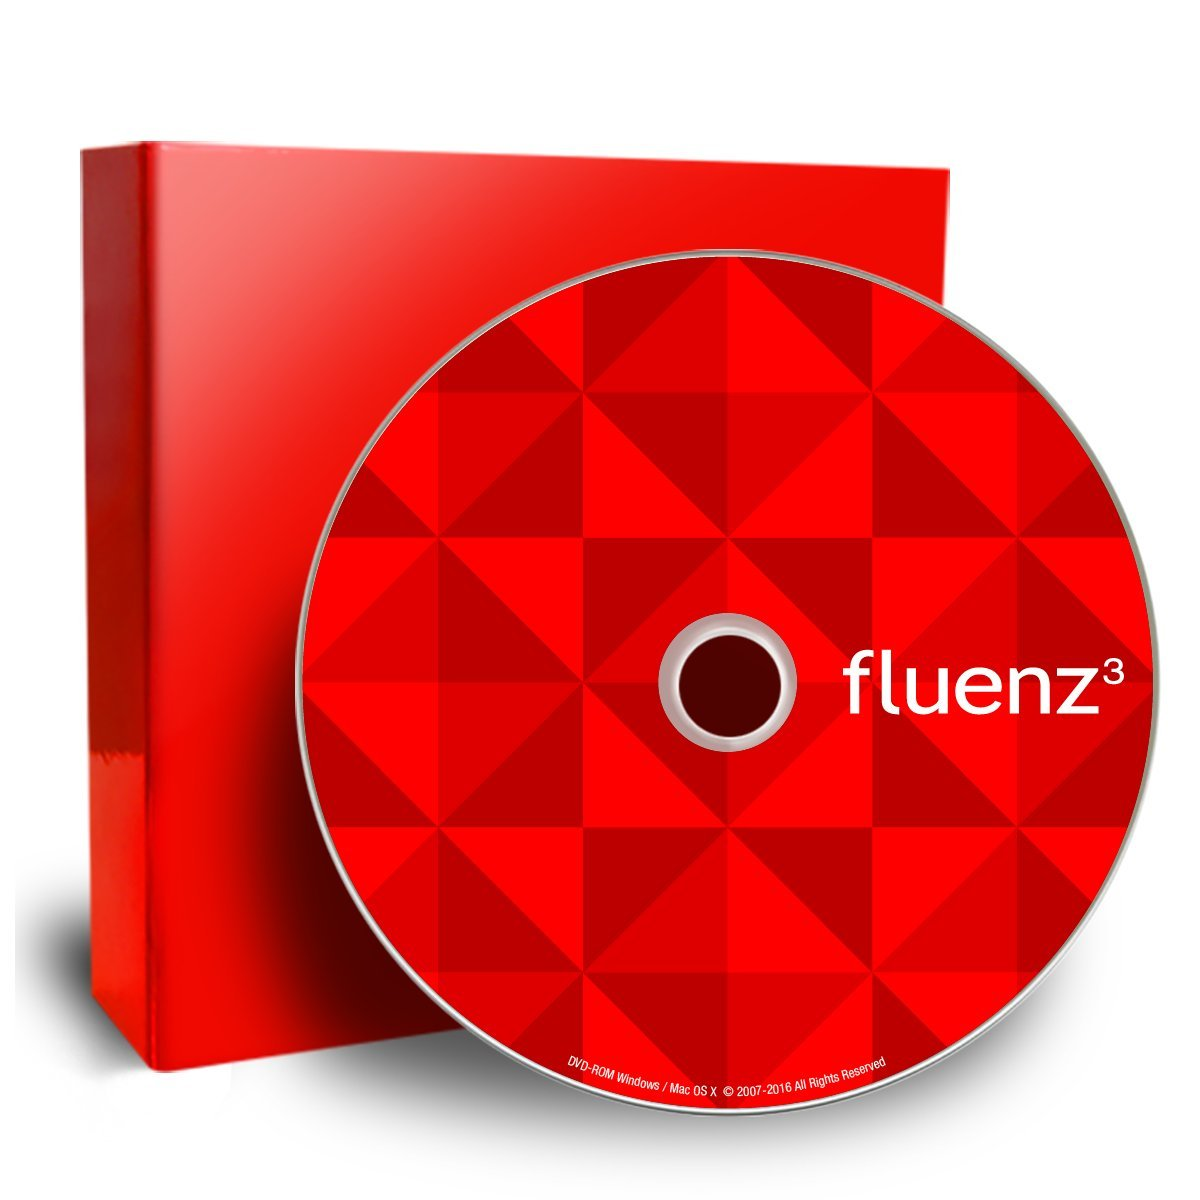 Fluenz Spanish (Spain) 1+2+3+4+5 for Mac, PC, iPhone, iPad & Android  Phones, Version 3